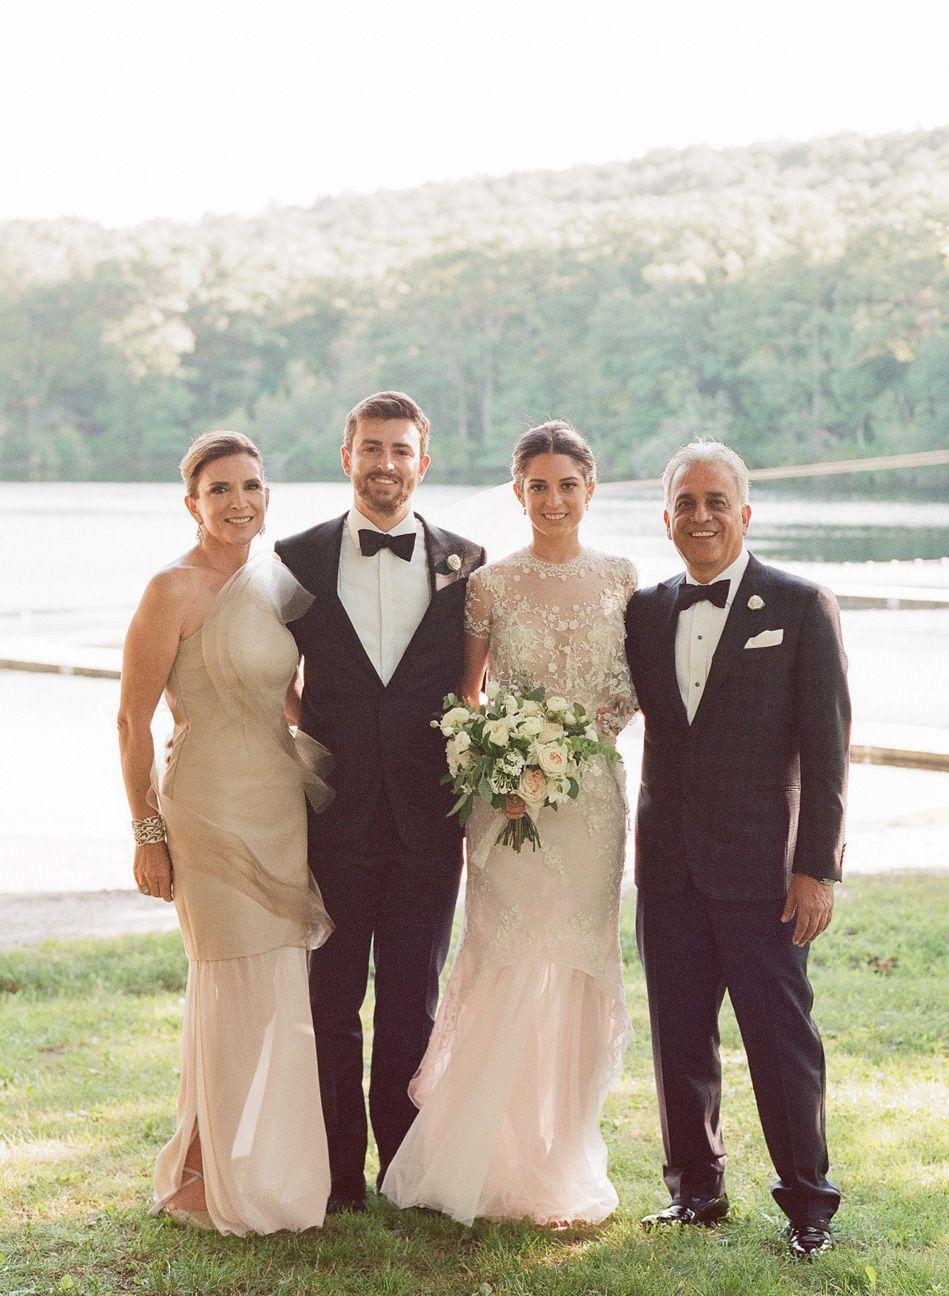 KarenHillPhotography-Parizat-Wedding-0359.jpg